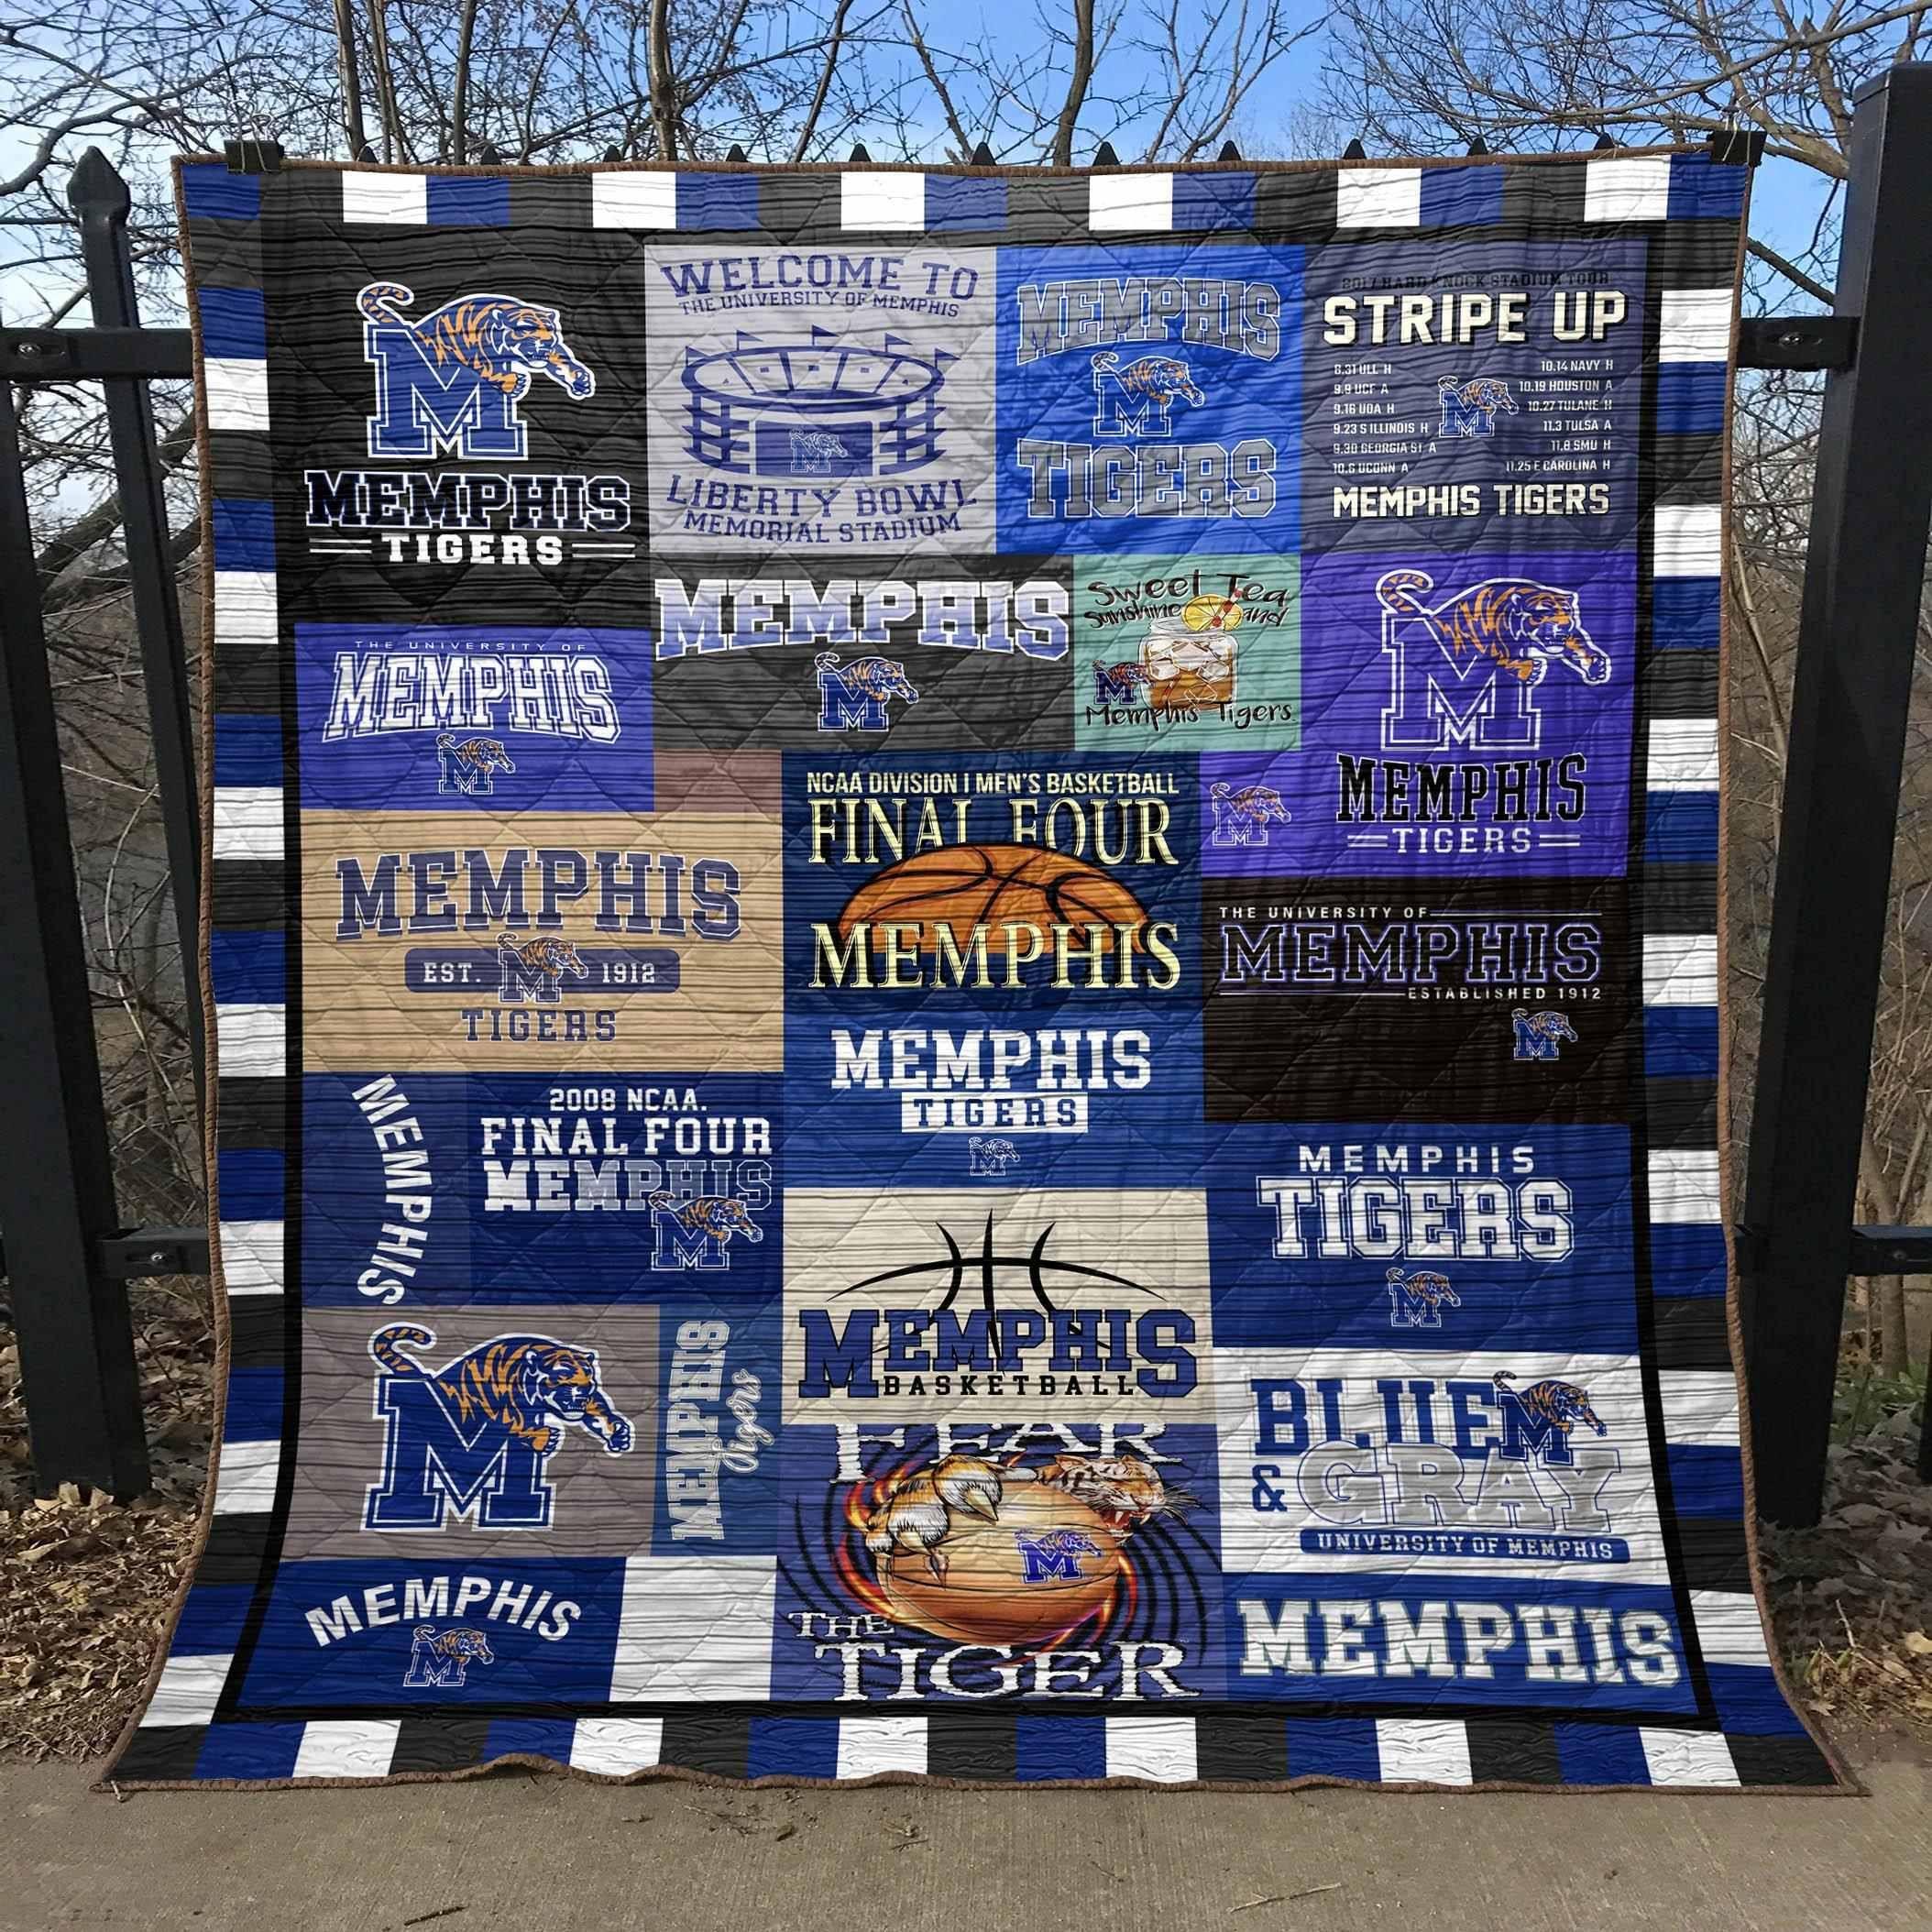 Memphis tigers university of memphis athletic teams stripe